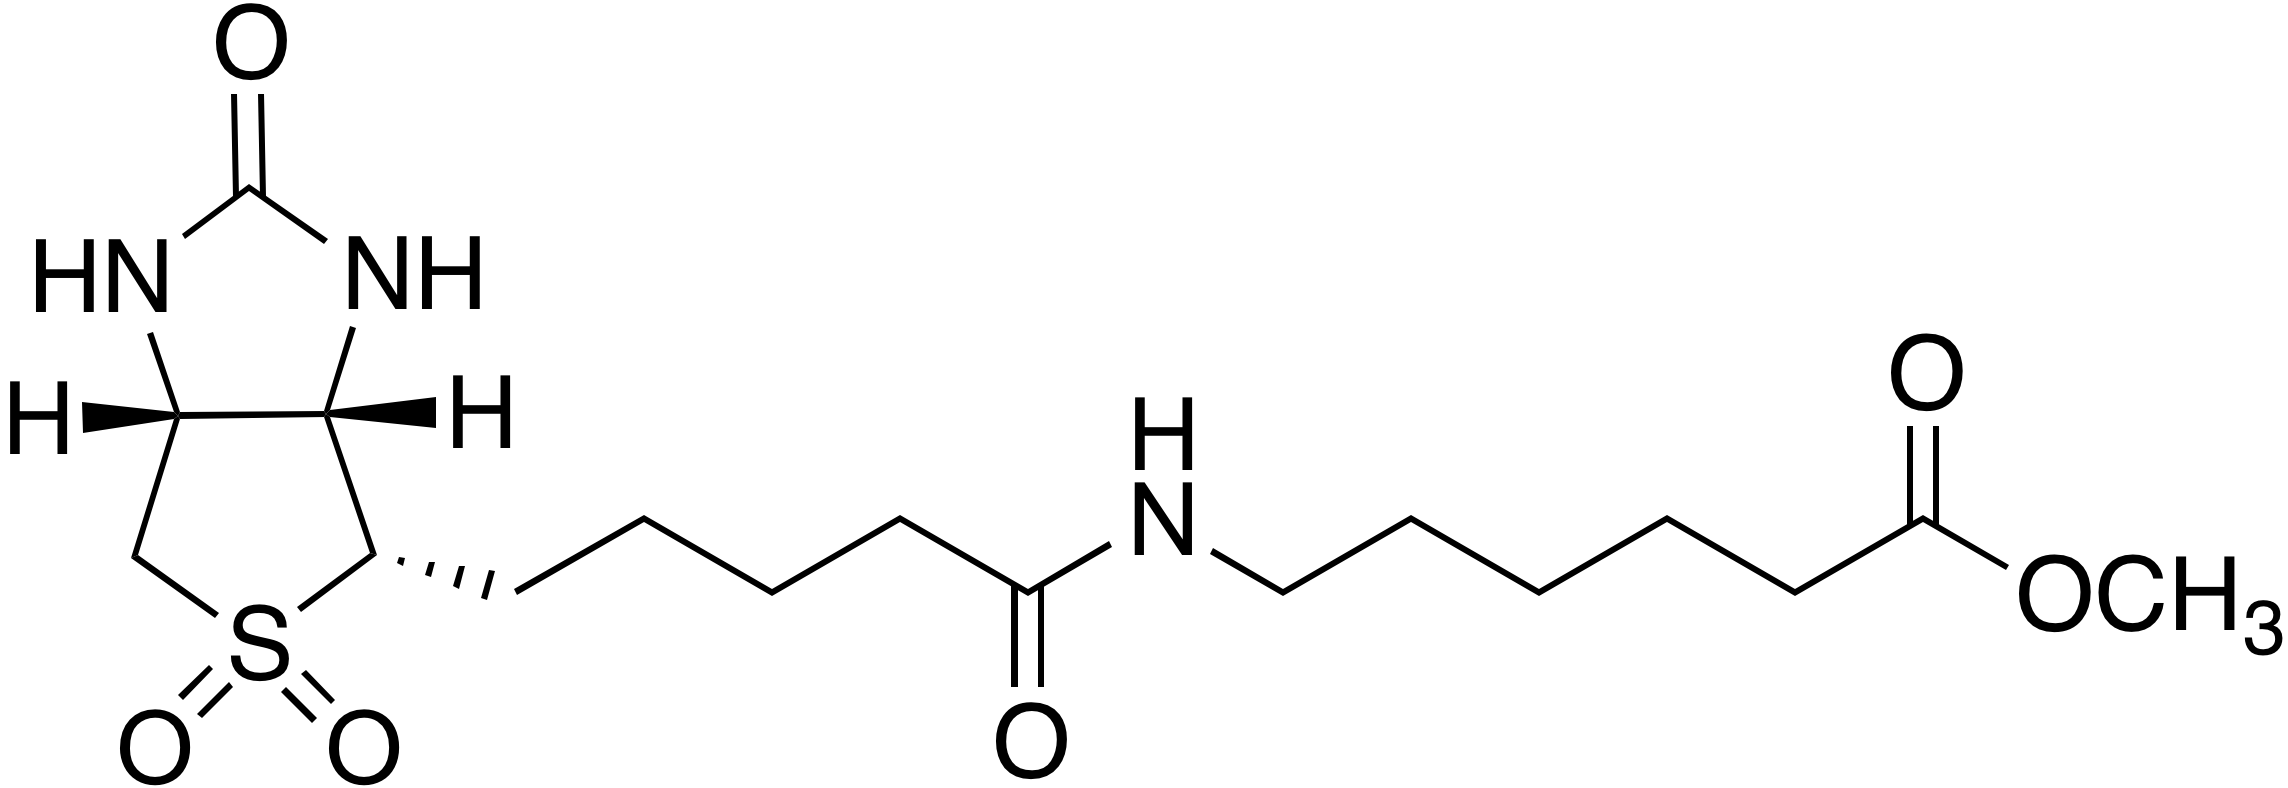 Biotin sulfone 6-aminohexanoic acid methyl ester